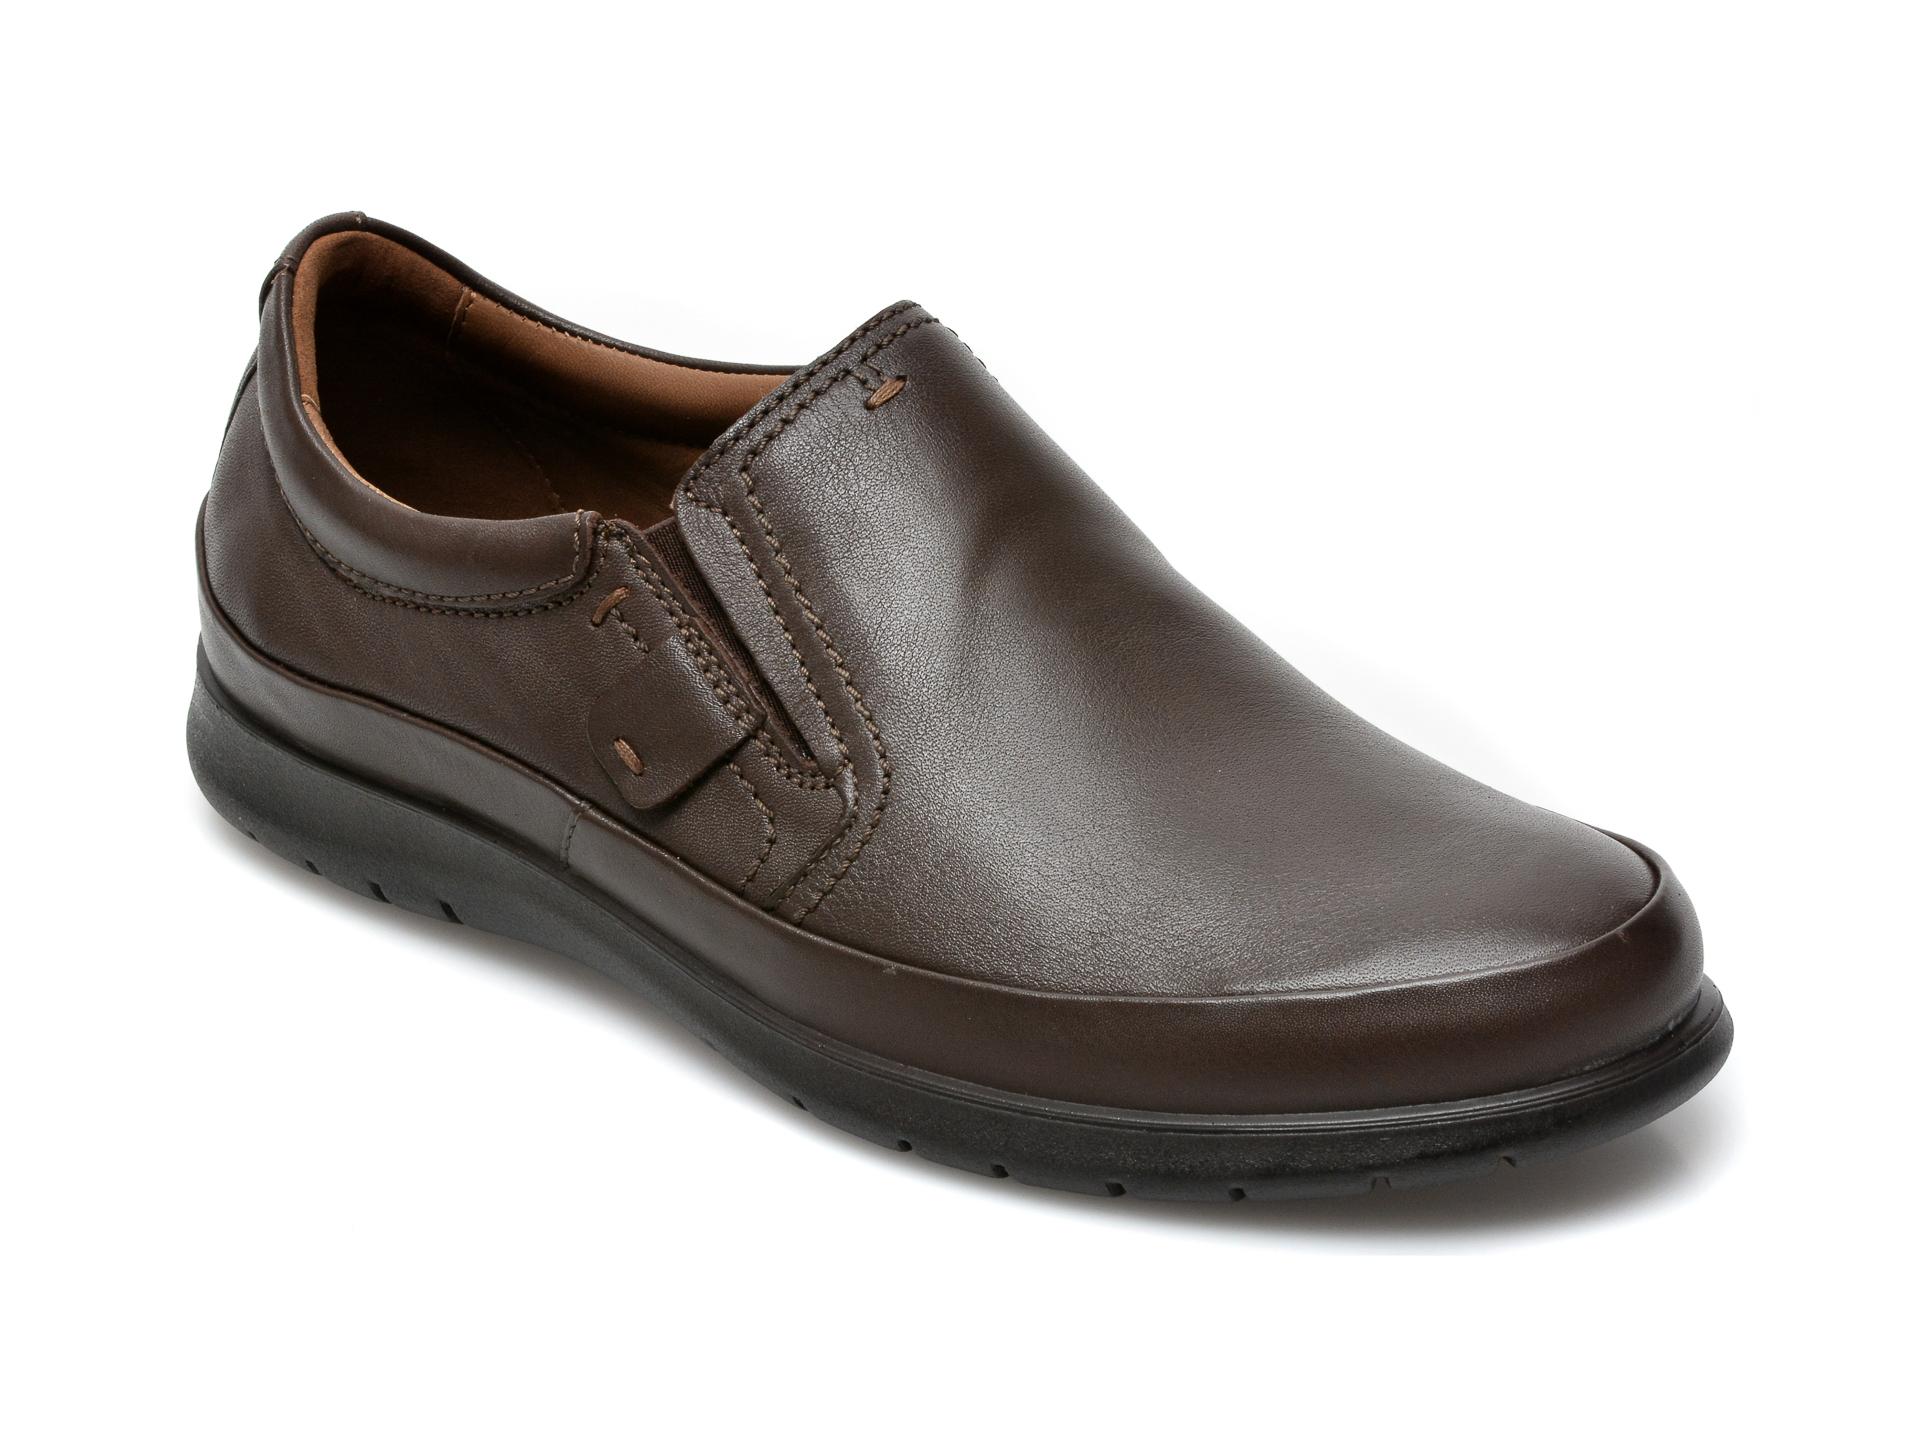 Pantofi SALAMANDER maro, 50802, din piele naturala imagine otter.ro 2021